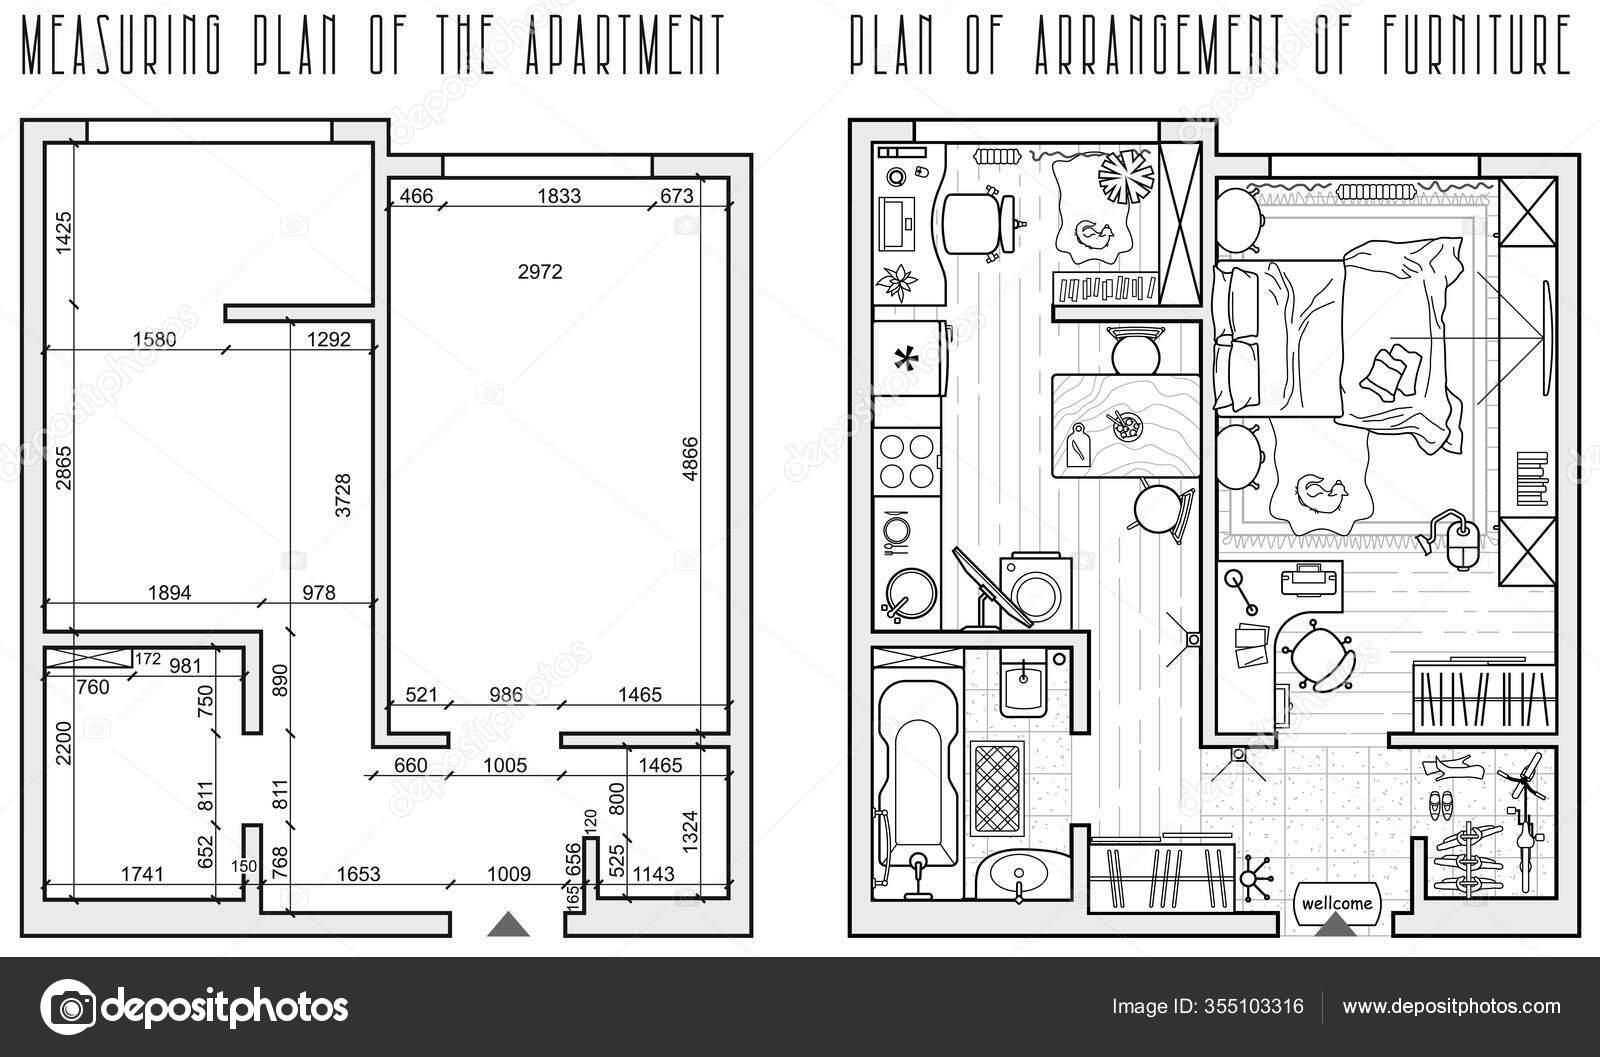 Architectural Measuring Plan Apartment Floor Plan Arrangement Furniture View Vector Stock Vector C Parmenow 355103316